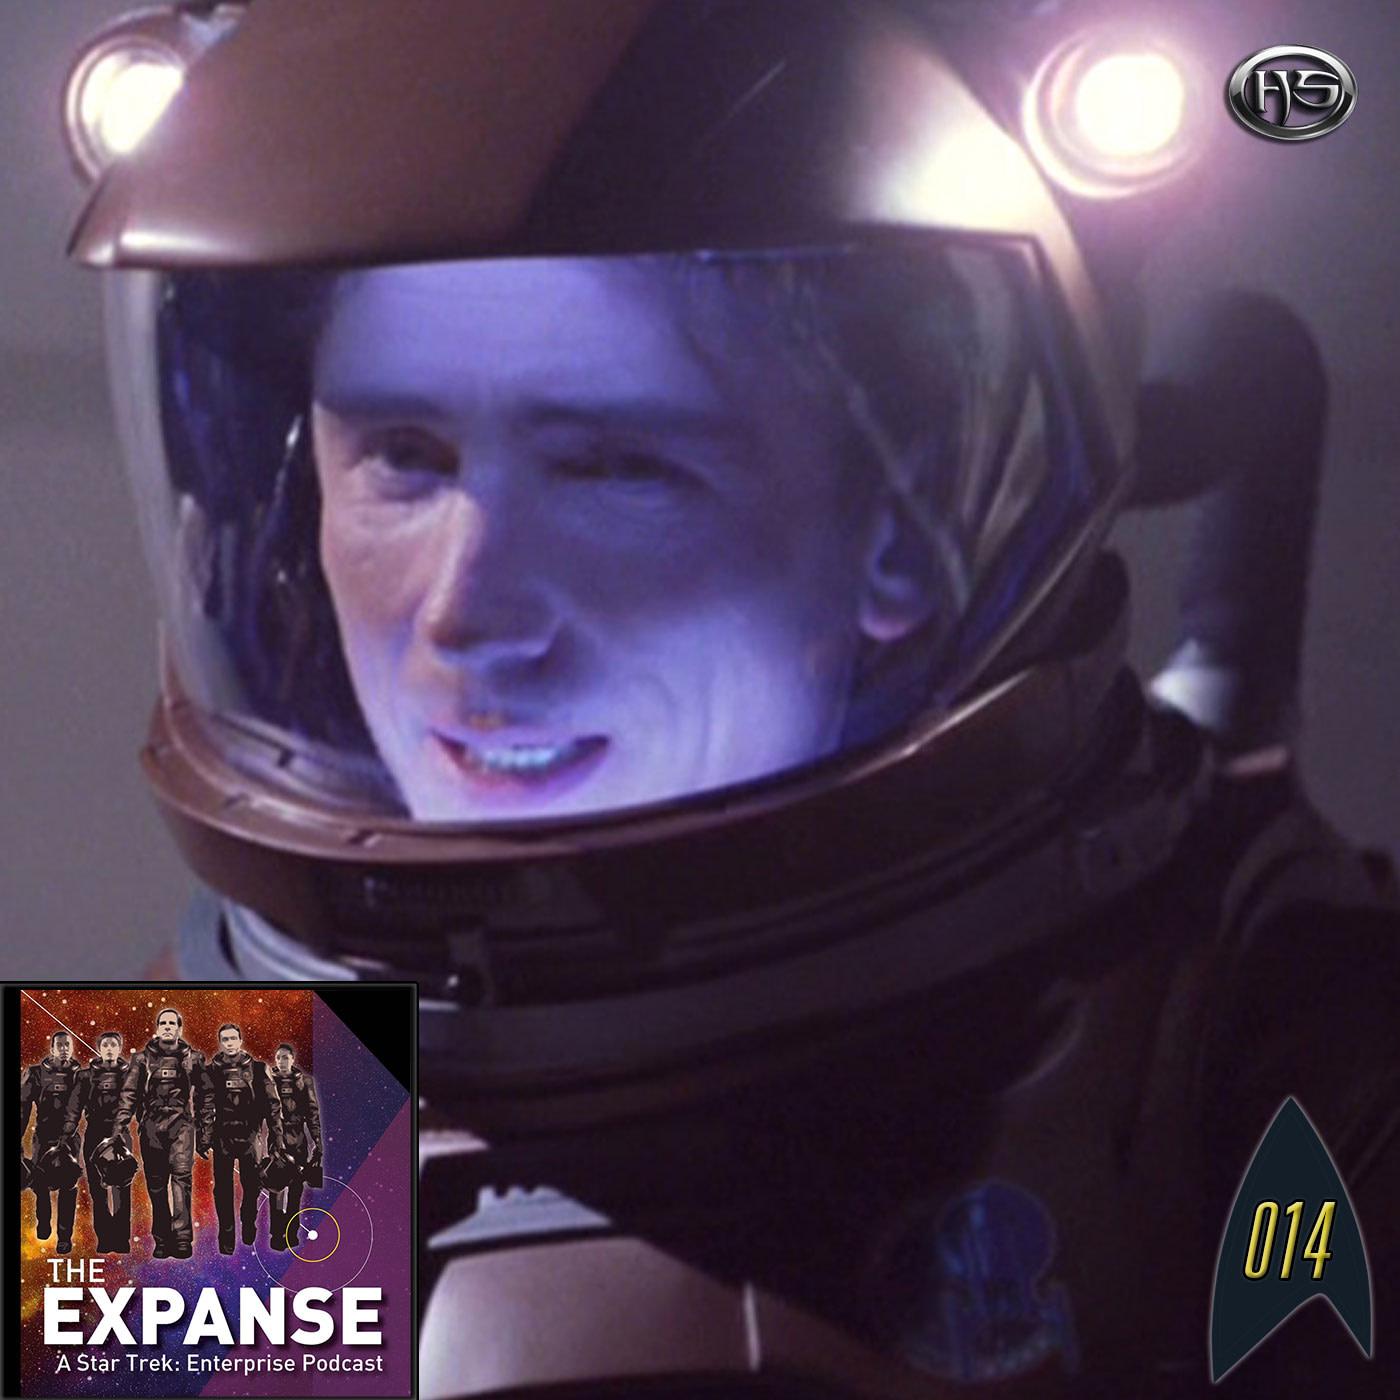 The Expanse Episode 14